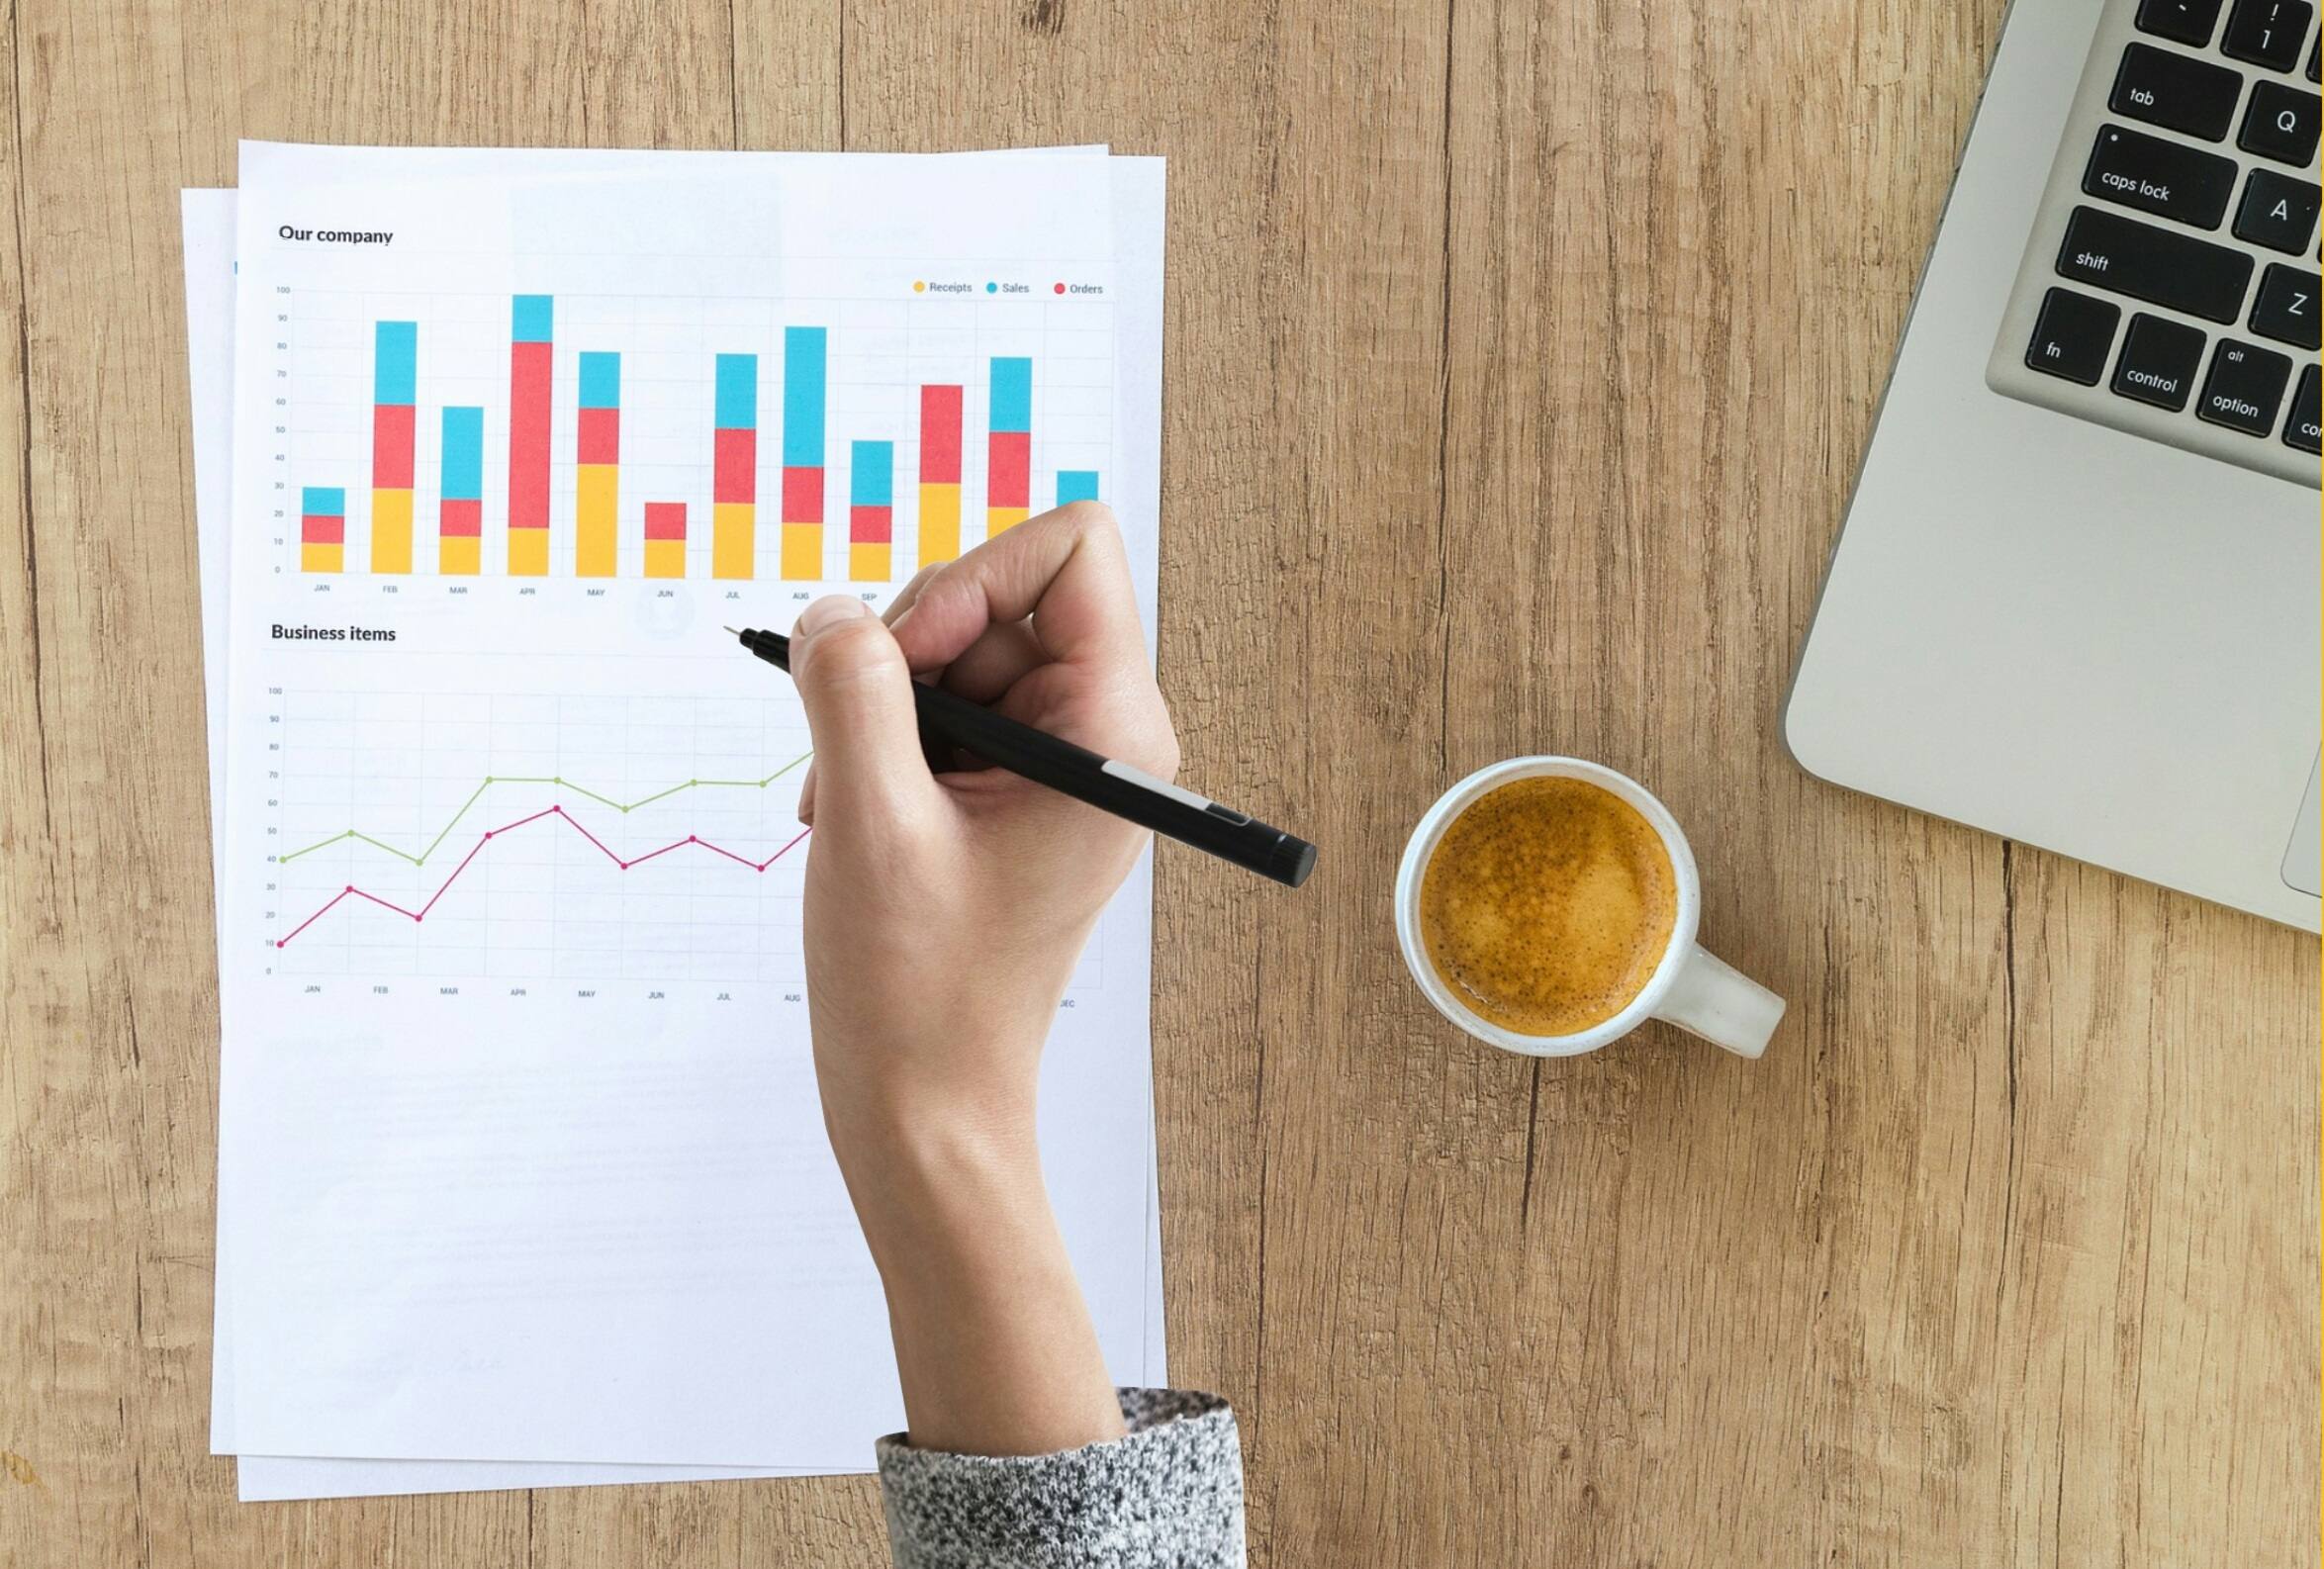 audit-chart-graph-hand-writing-finance-1446811-pxhere_com.jpg